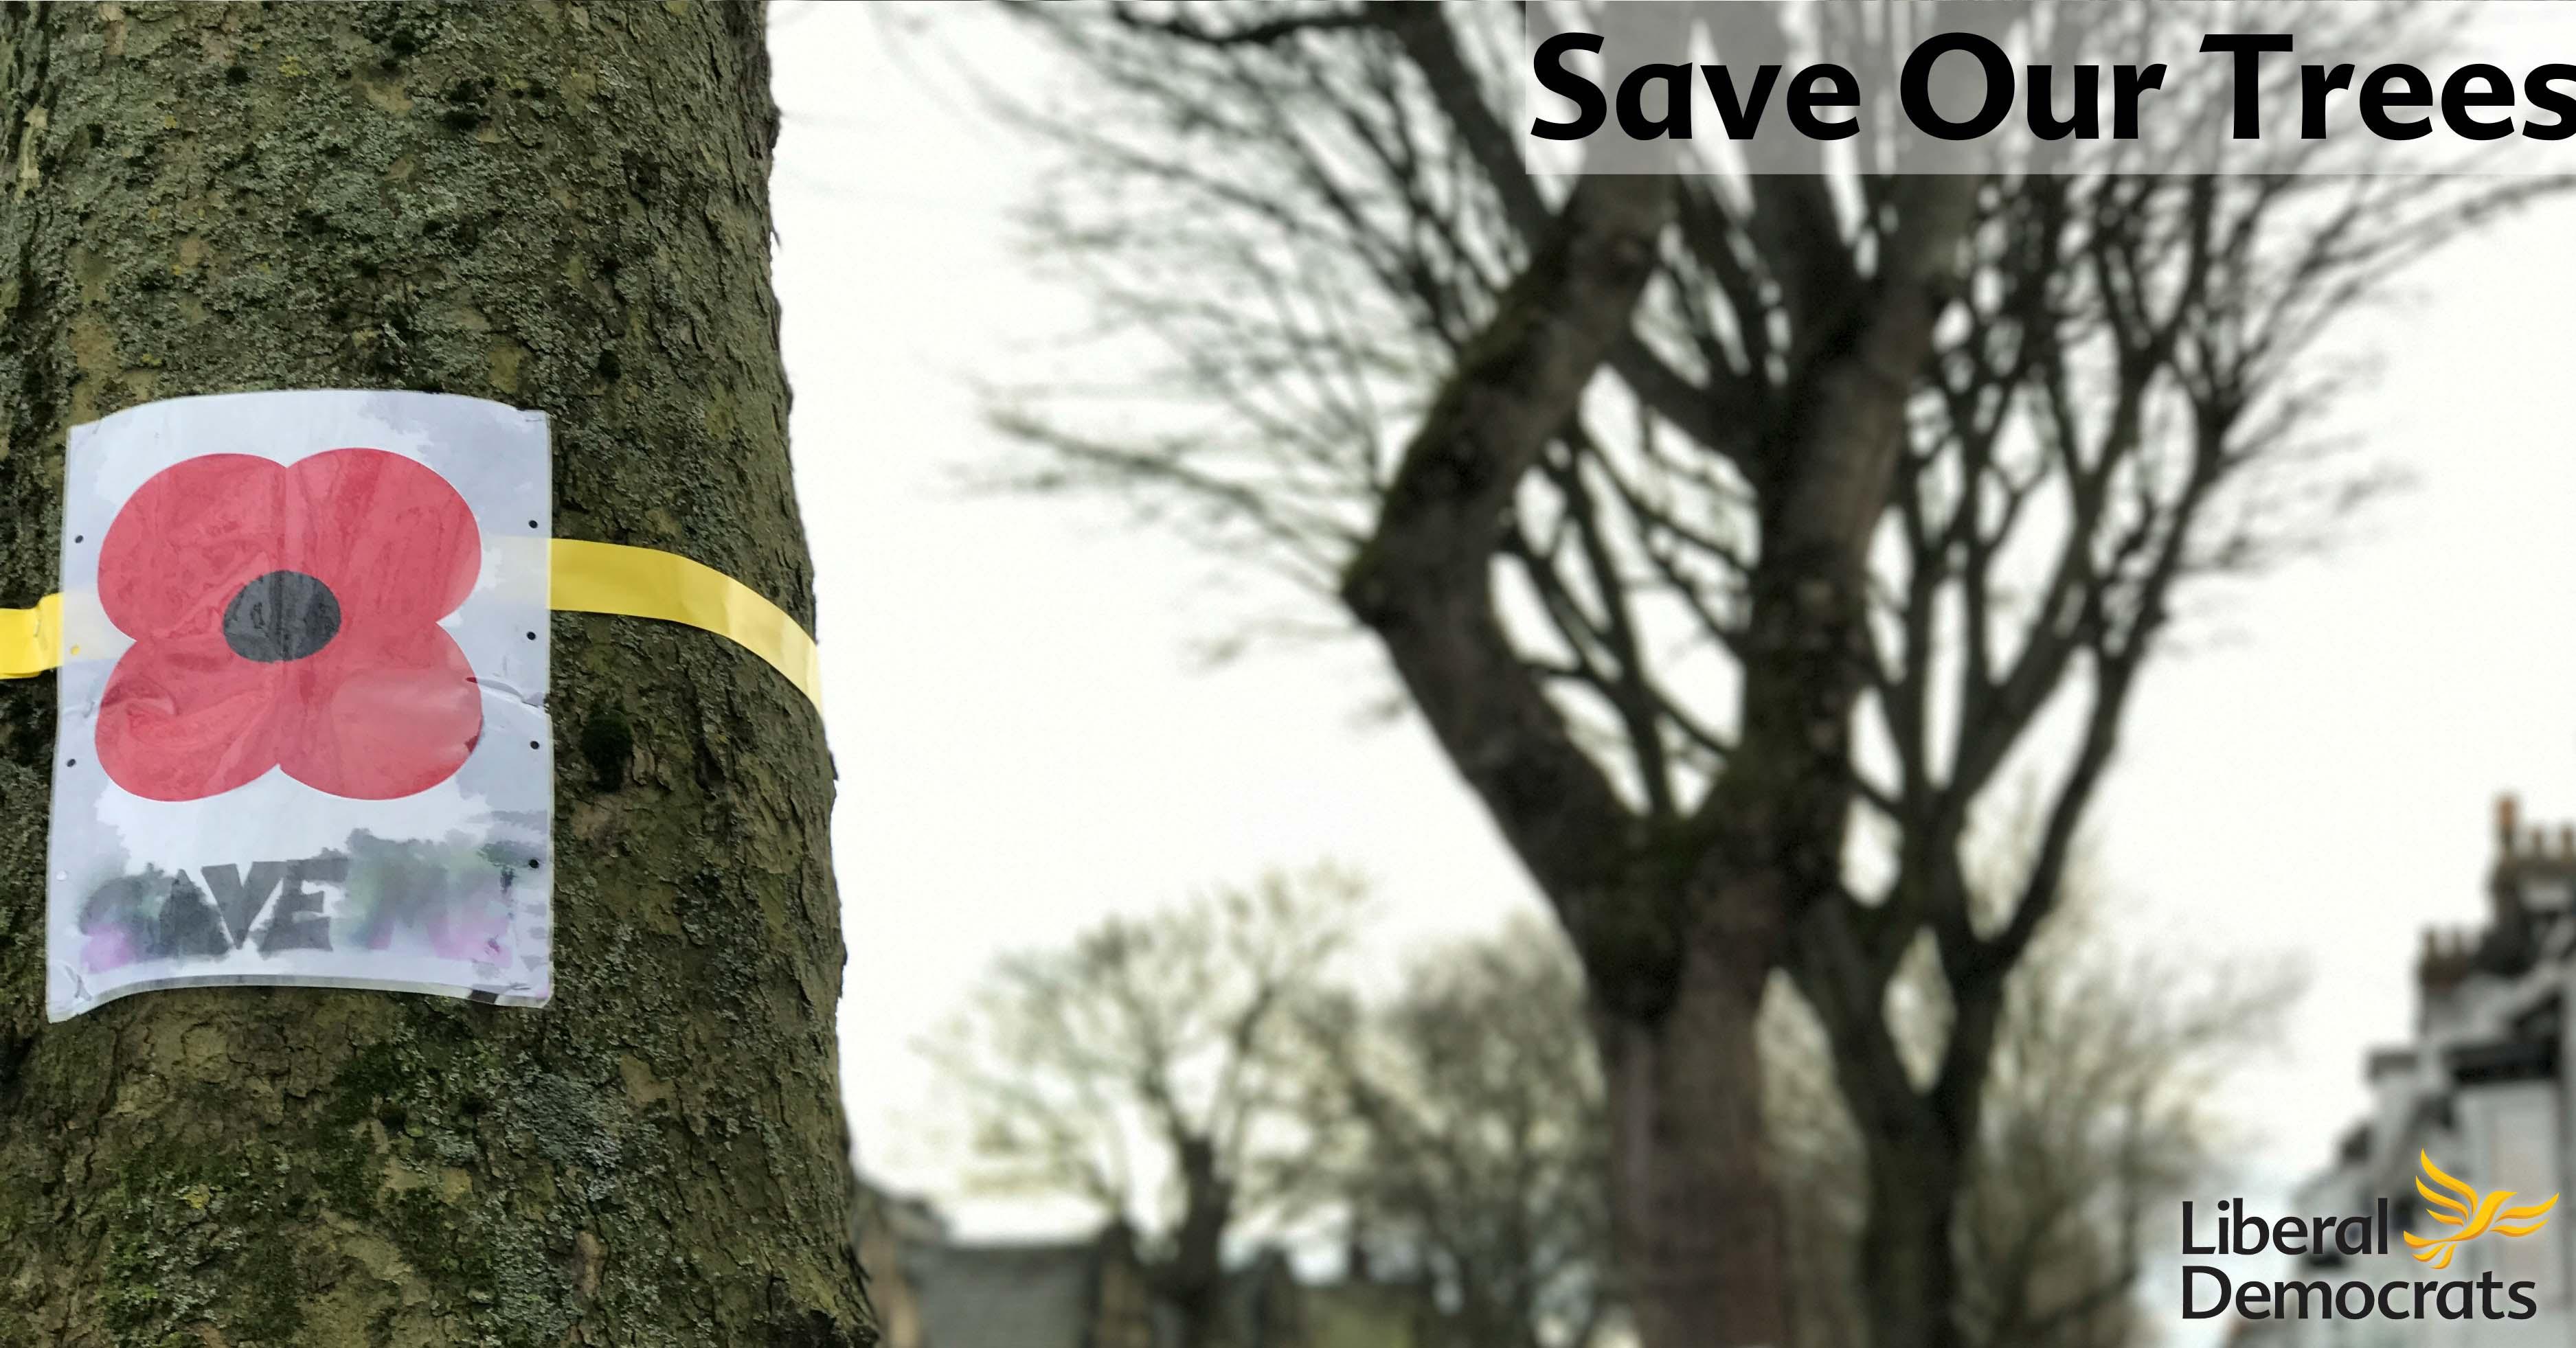 UPDATE: Sheffield's Trees